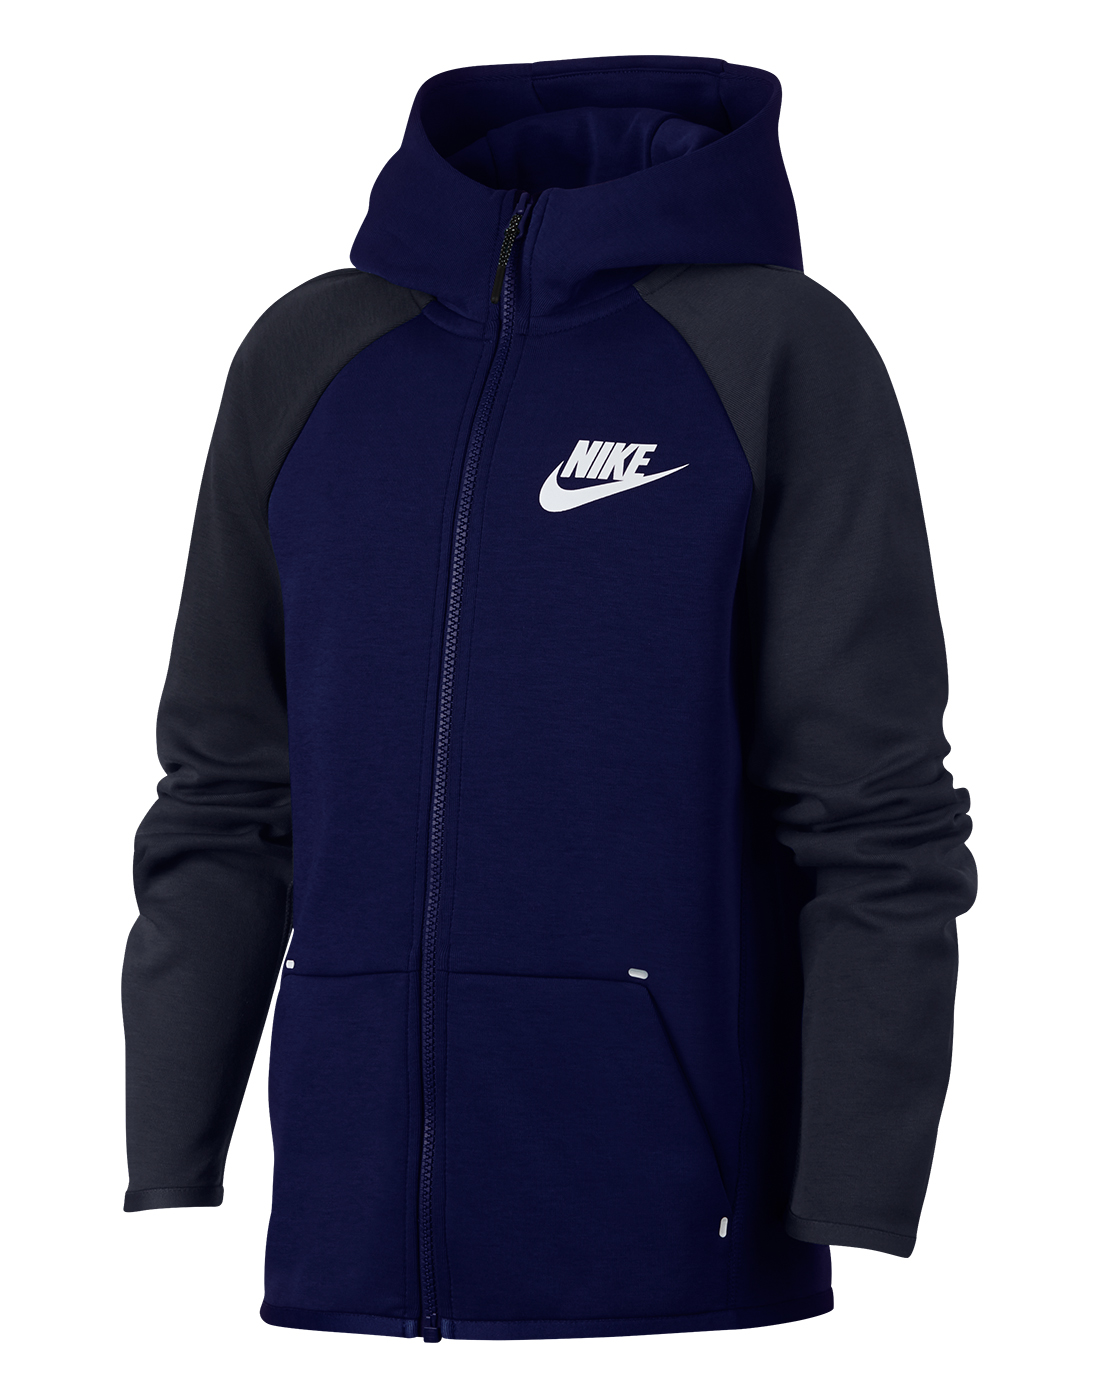 b70e7be53c34 Boy s Navy Nike Tech Fleece Hoodie